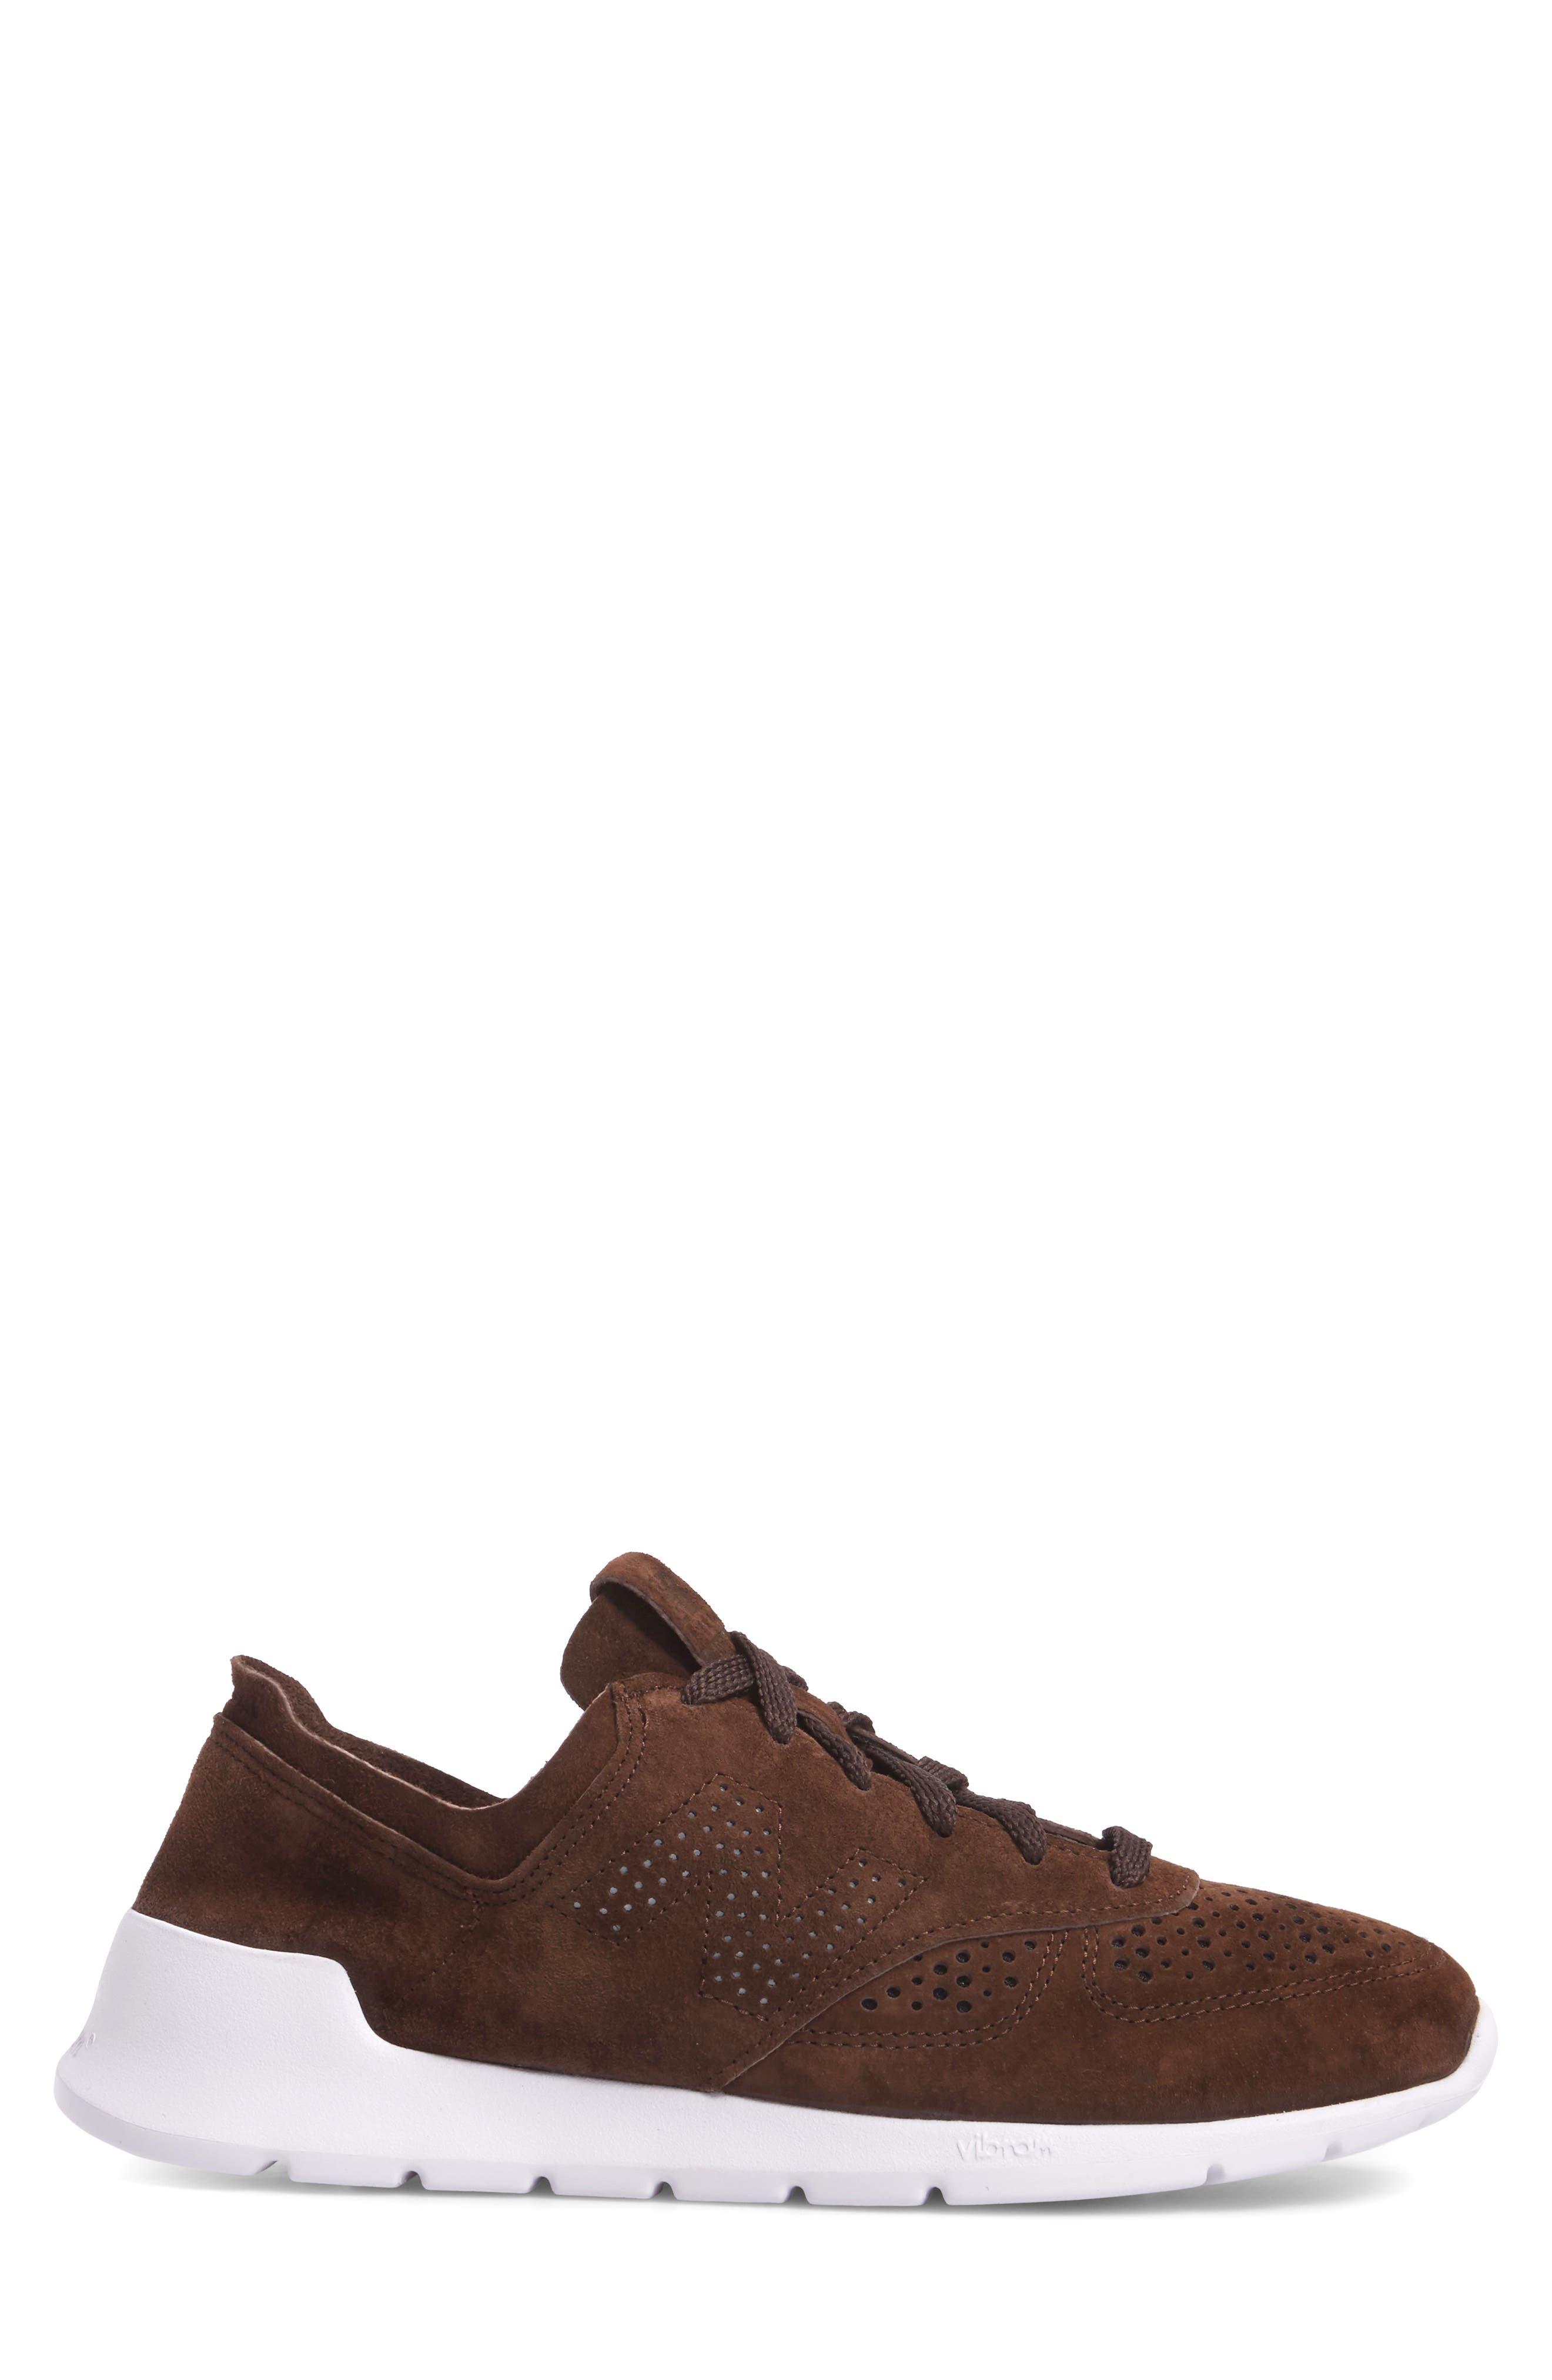 1978 Sneaker,                             Alternate thumbnail 3, color,                             Brown